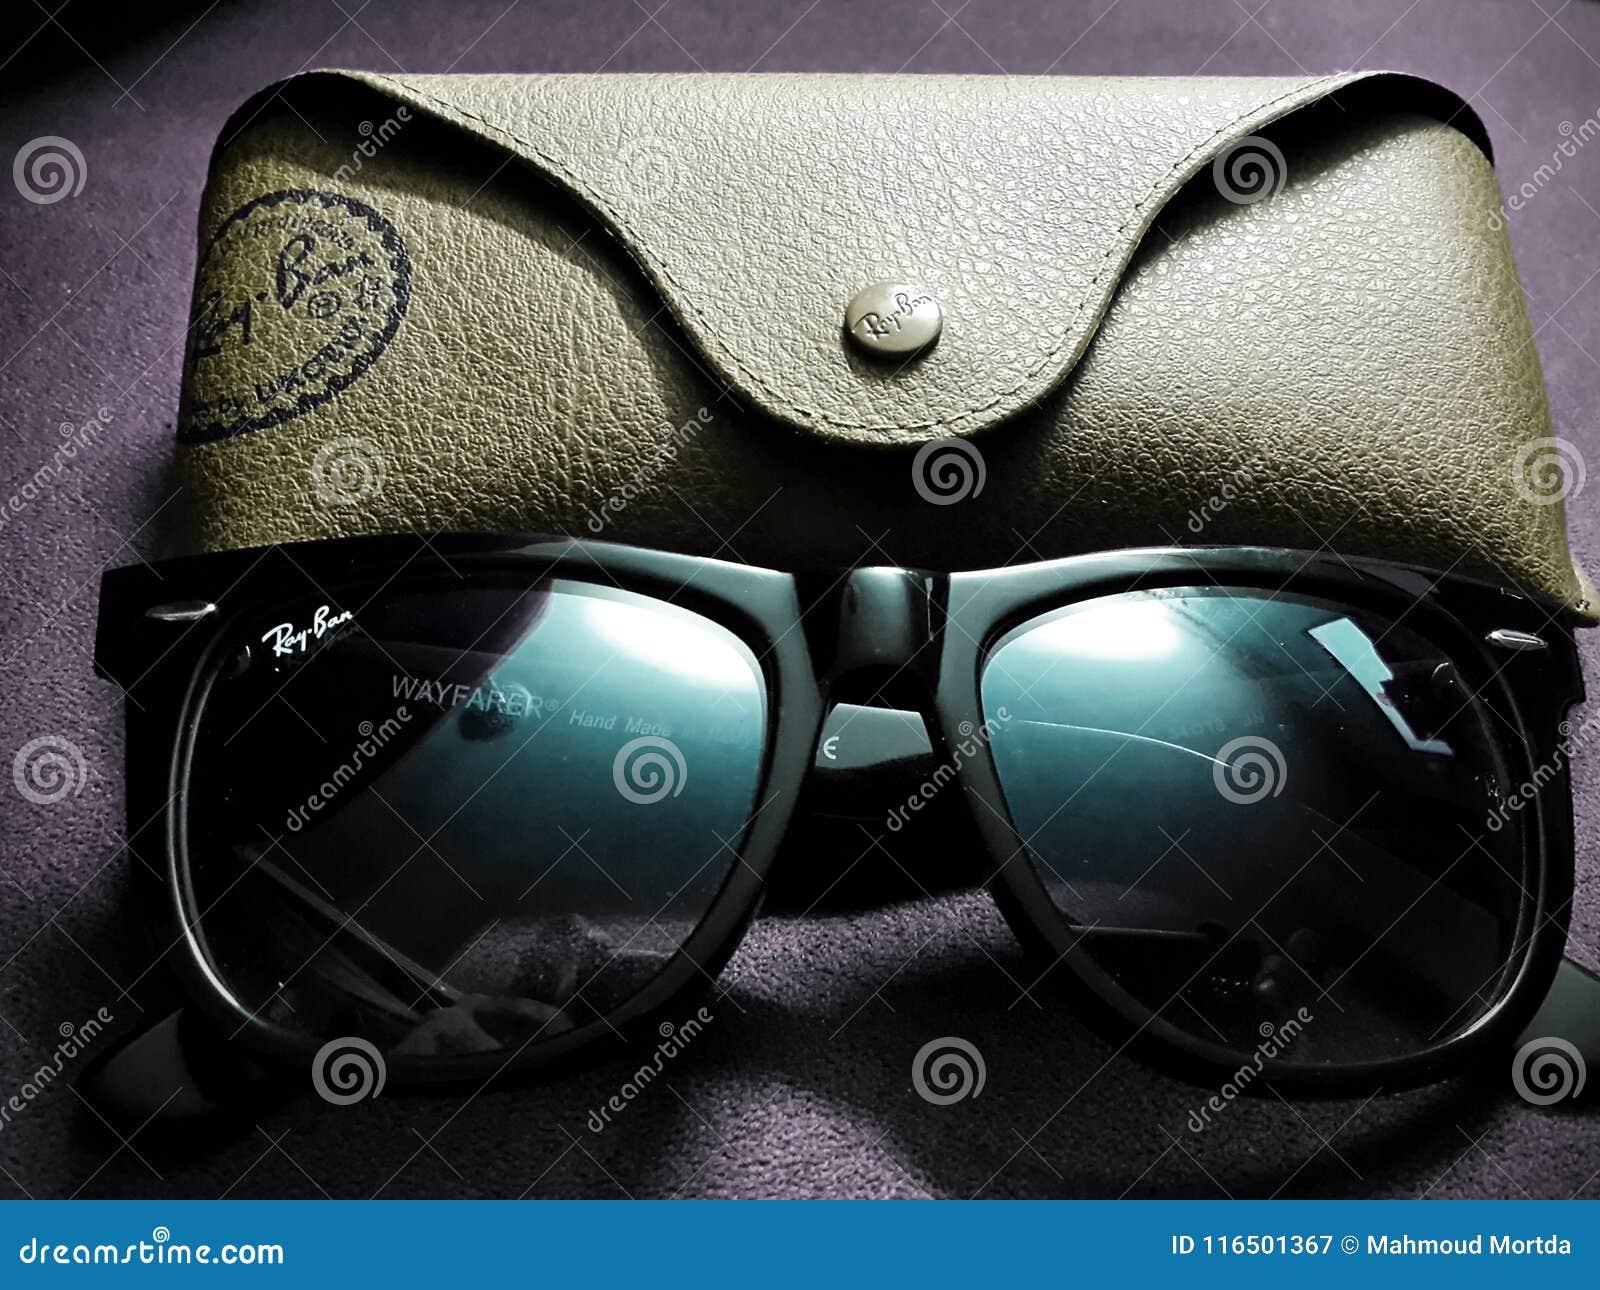 An `Original Wayfarer Classic Black` Ray-Ban Sunglasses with it`s case c33221adda3f